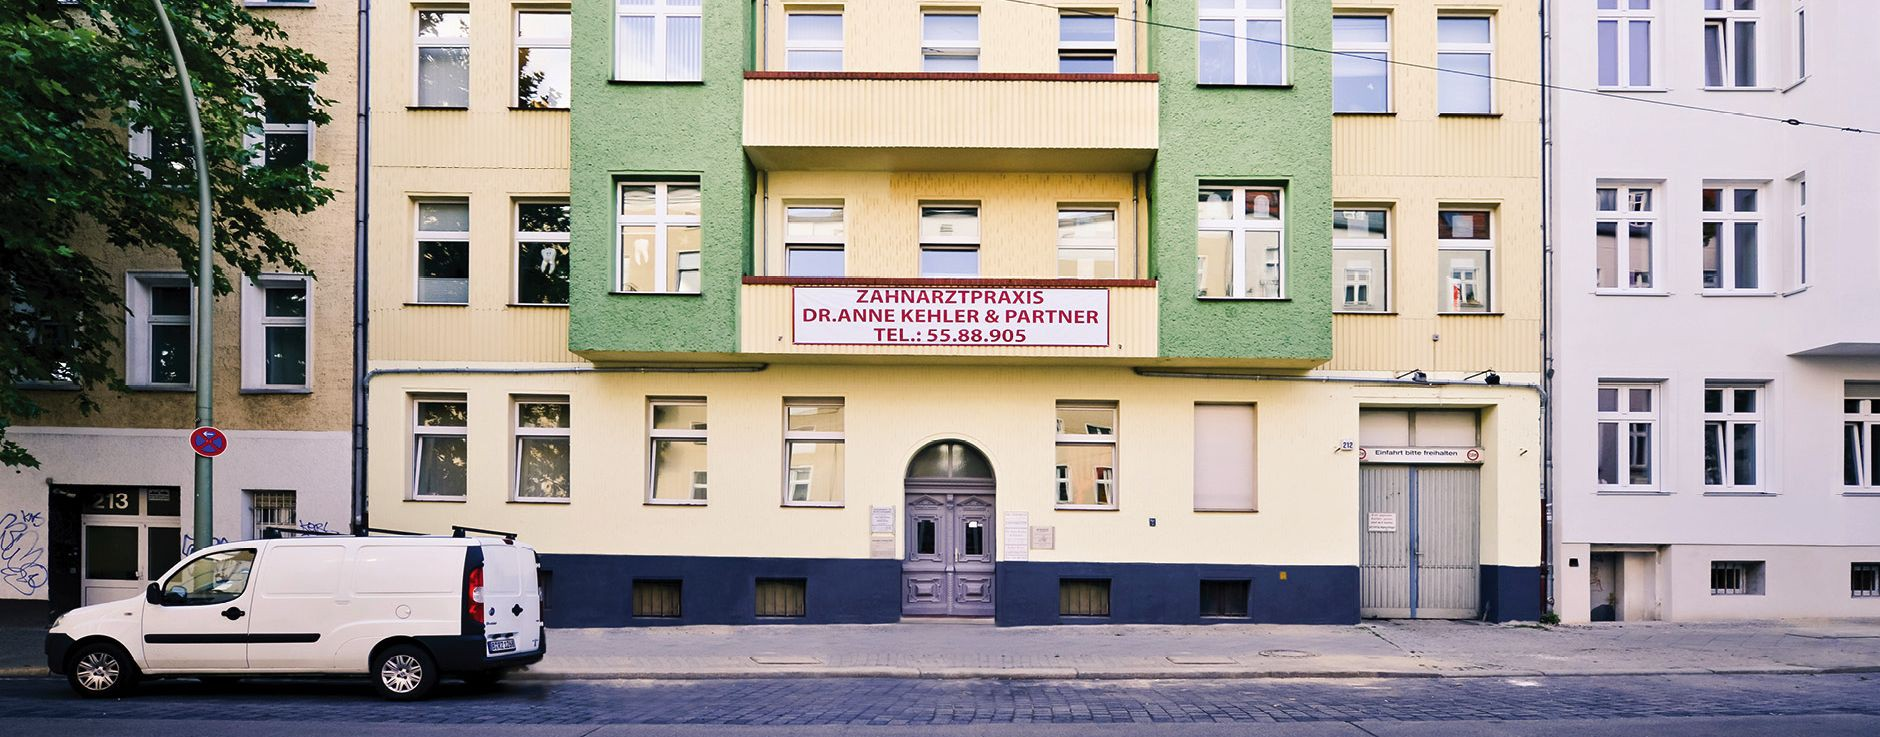 Hausansicht Zahnarzt, Siegfriedstraße 212, 10365 Berlin Lichtenberg